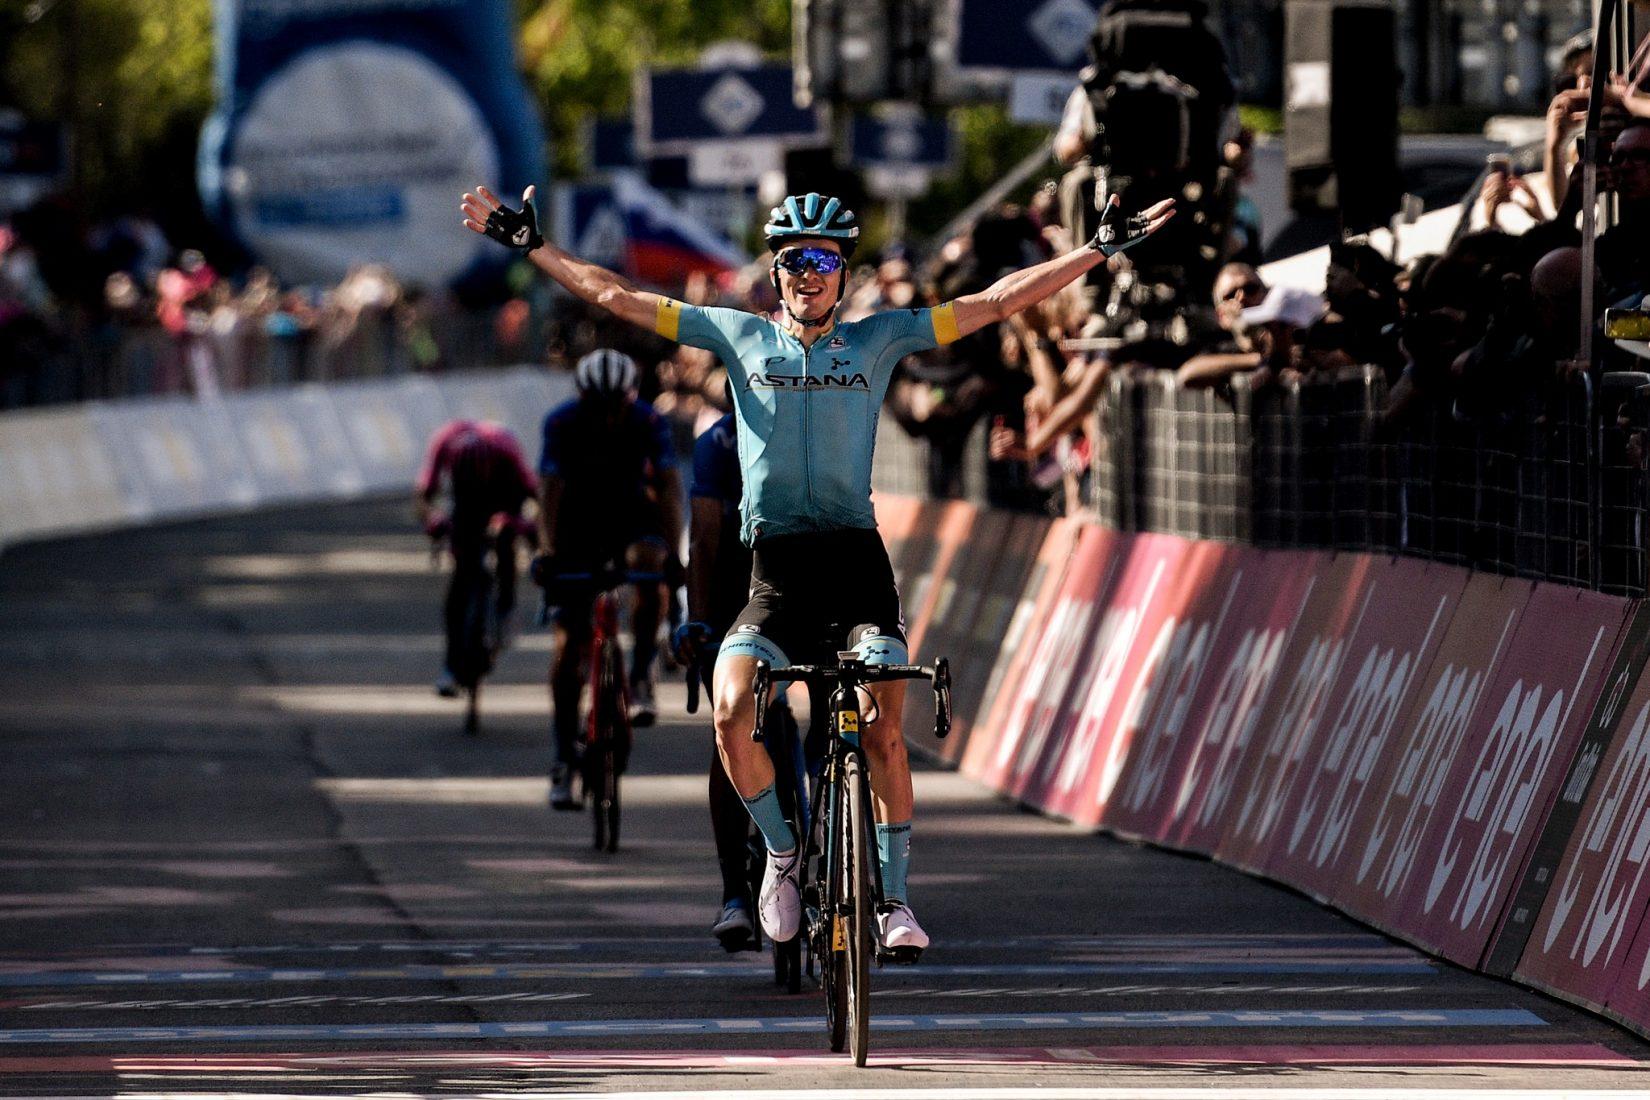 Giro 2019: Carapaz, le mani sul Giro